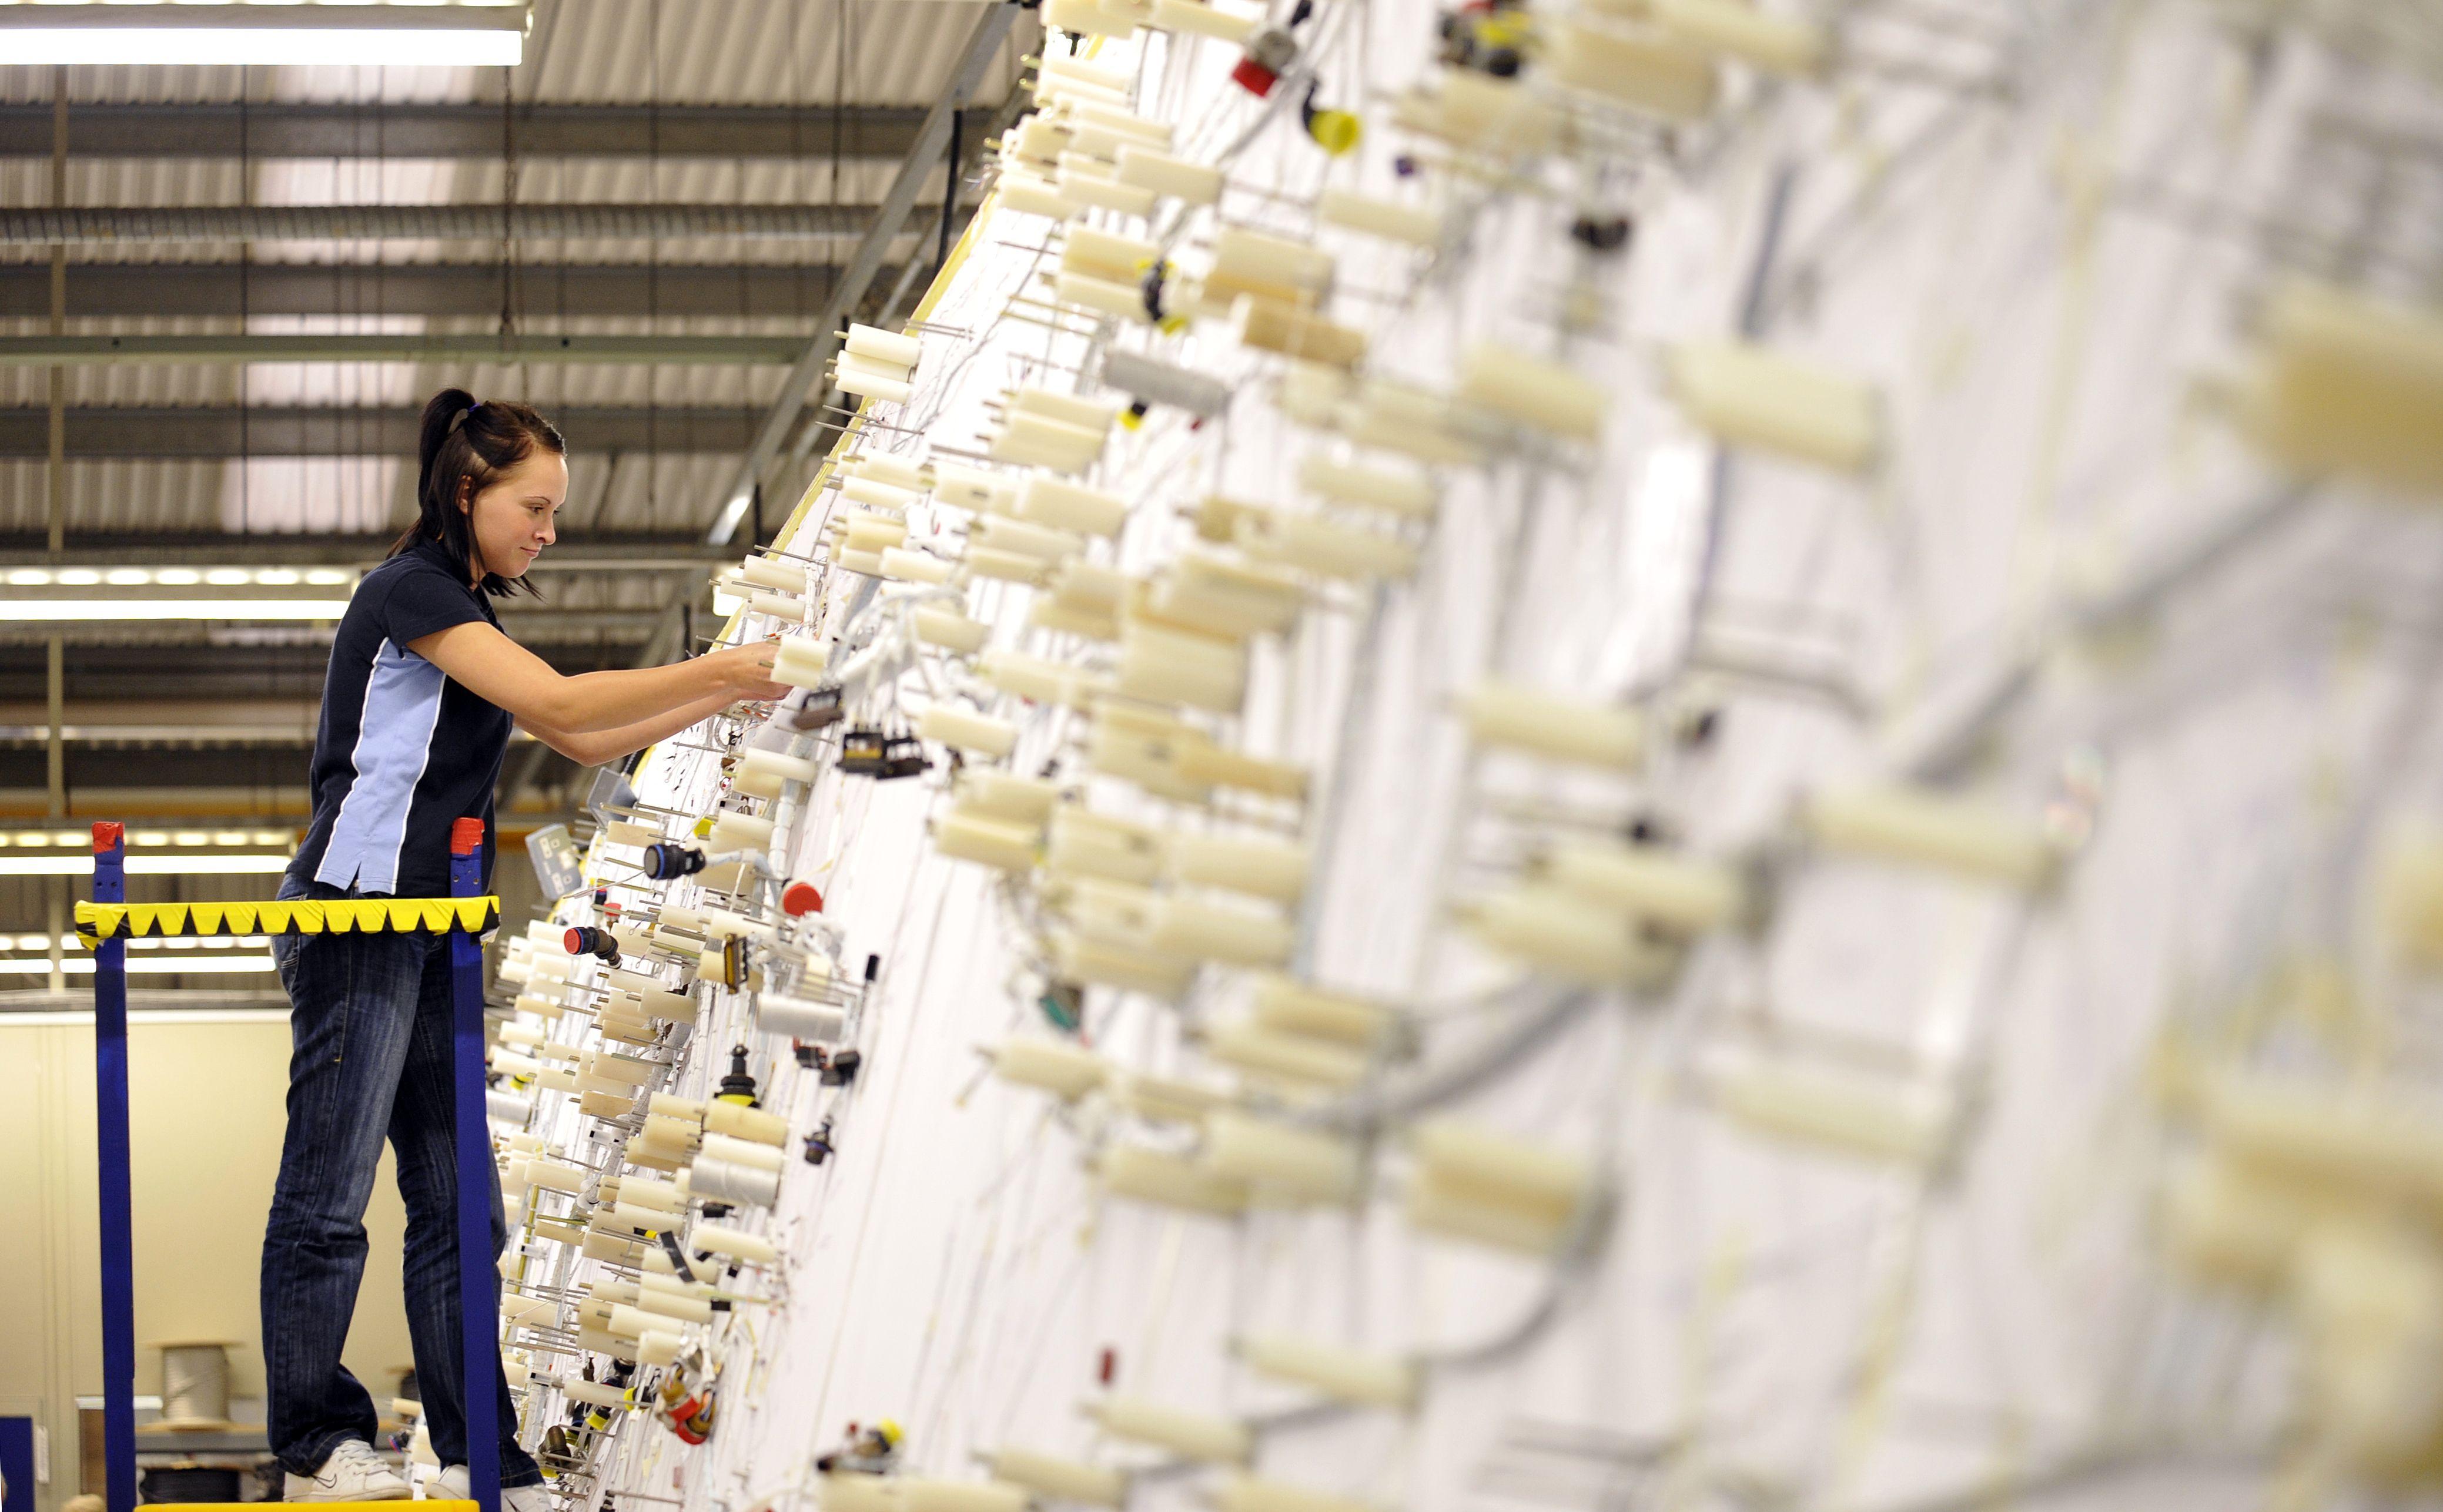 kembrey wiring systems ltd apprenticeships pinterest rh pinterest co uk kembrey wiring systems Sprinkler System Wiring Diagram